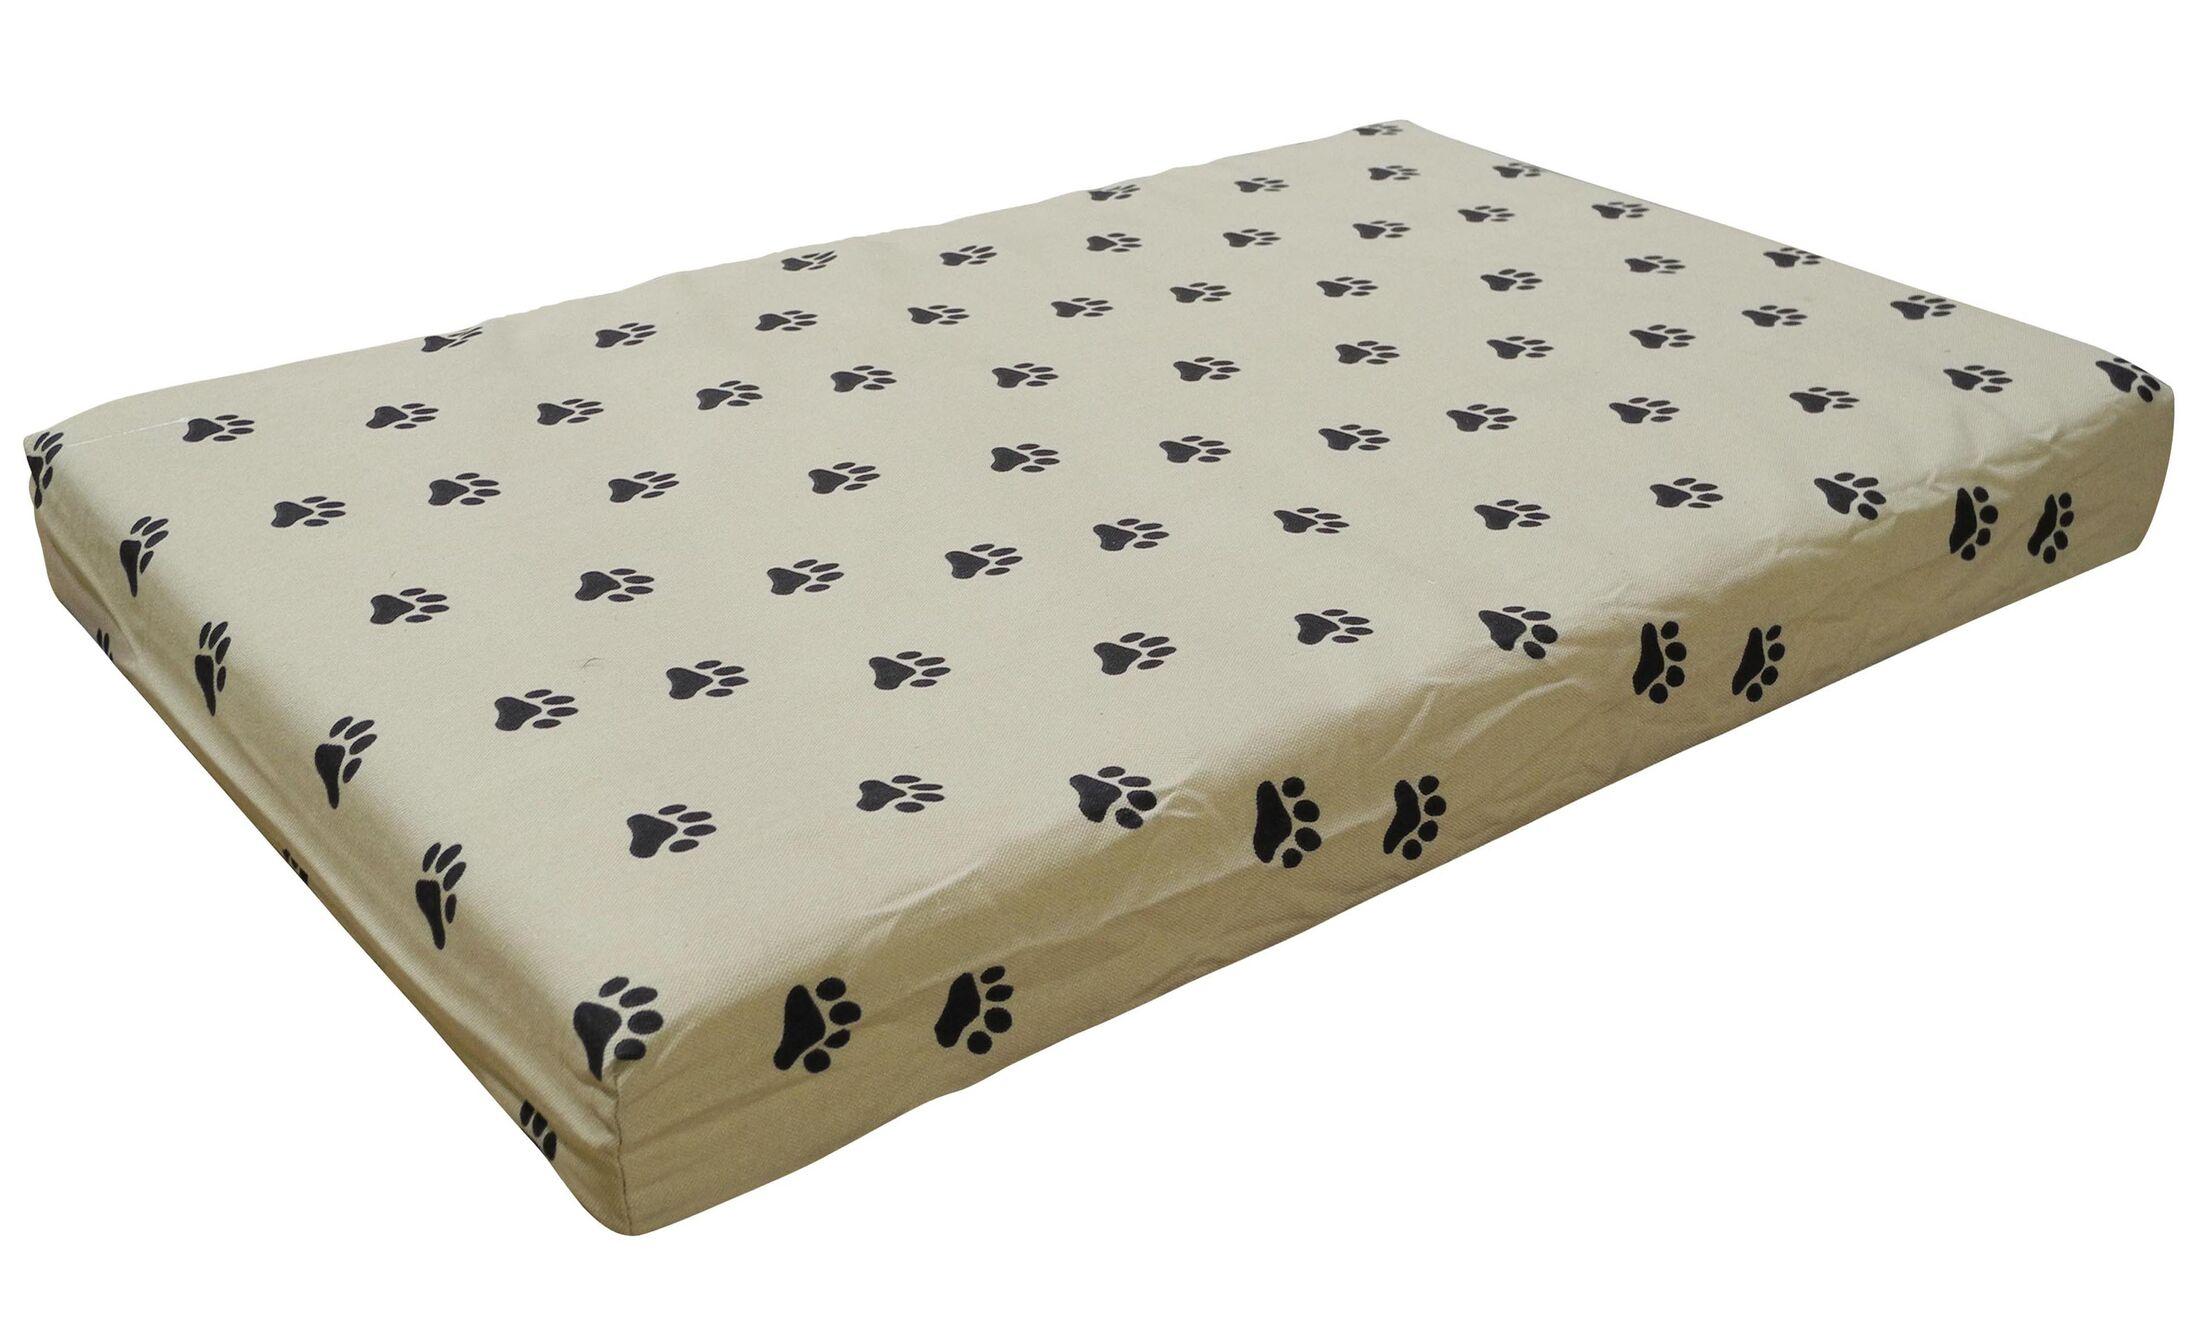 Memory Foam Orthopedic Pet Bed I Pillow/Classic Size: Large - 46